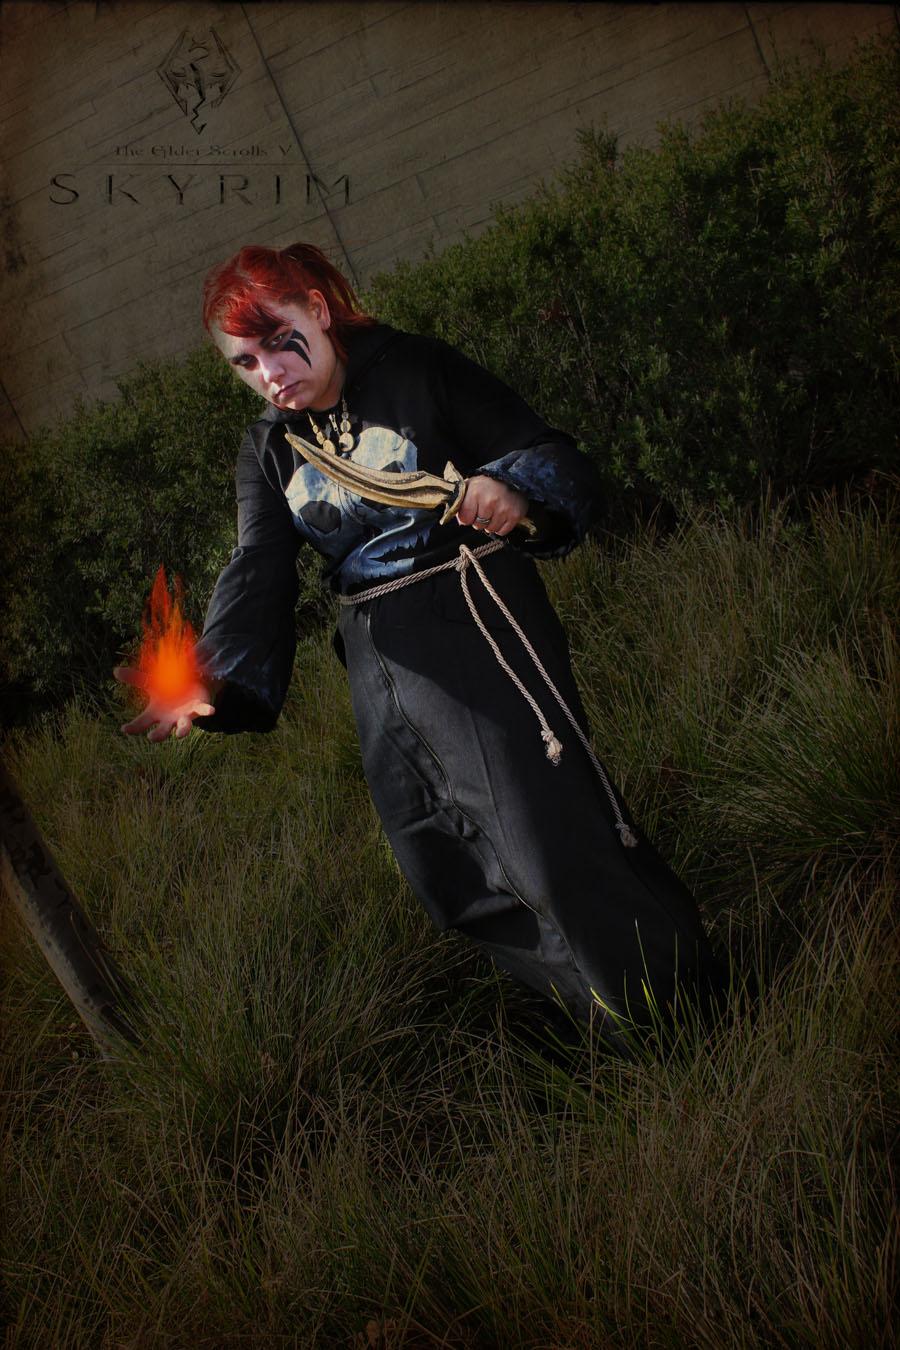 Skyrim - The Necromancer of Flame by Dorchette on DeviantArt